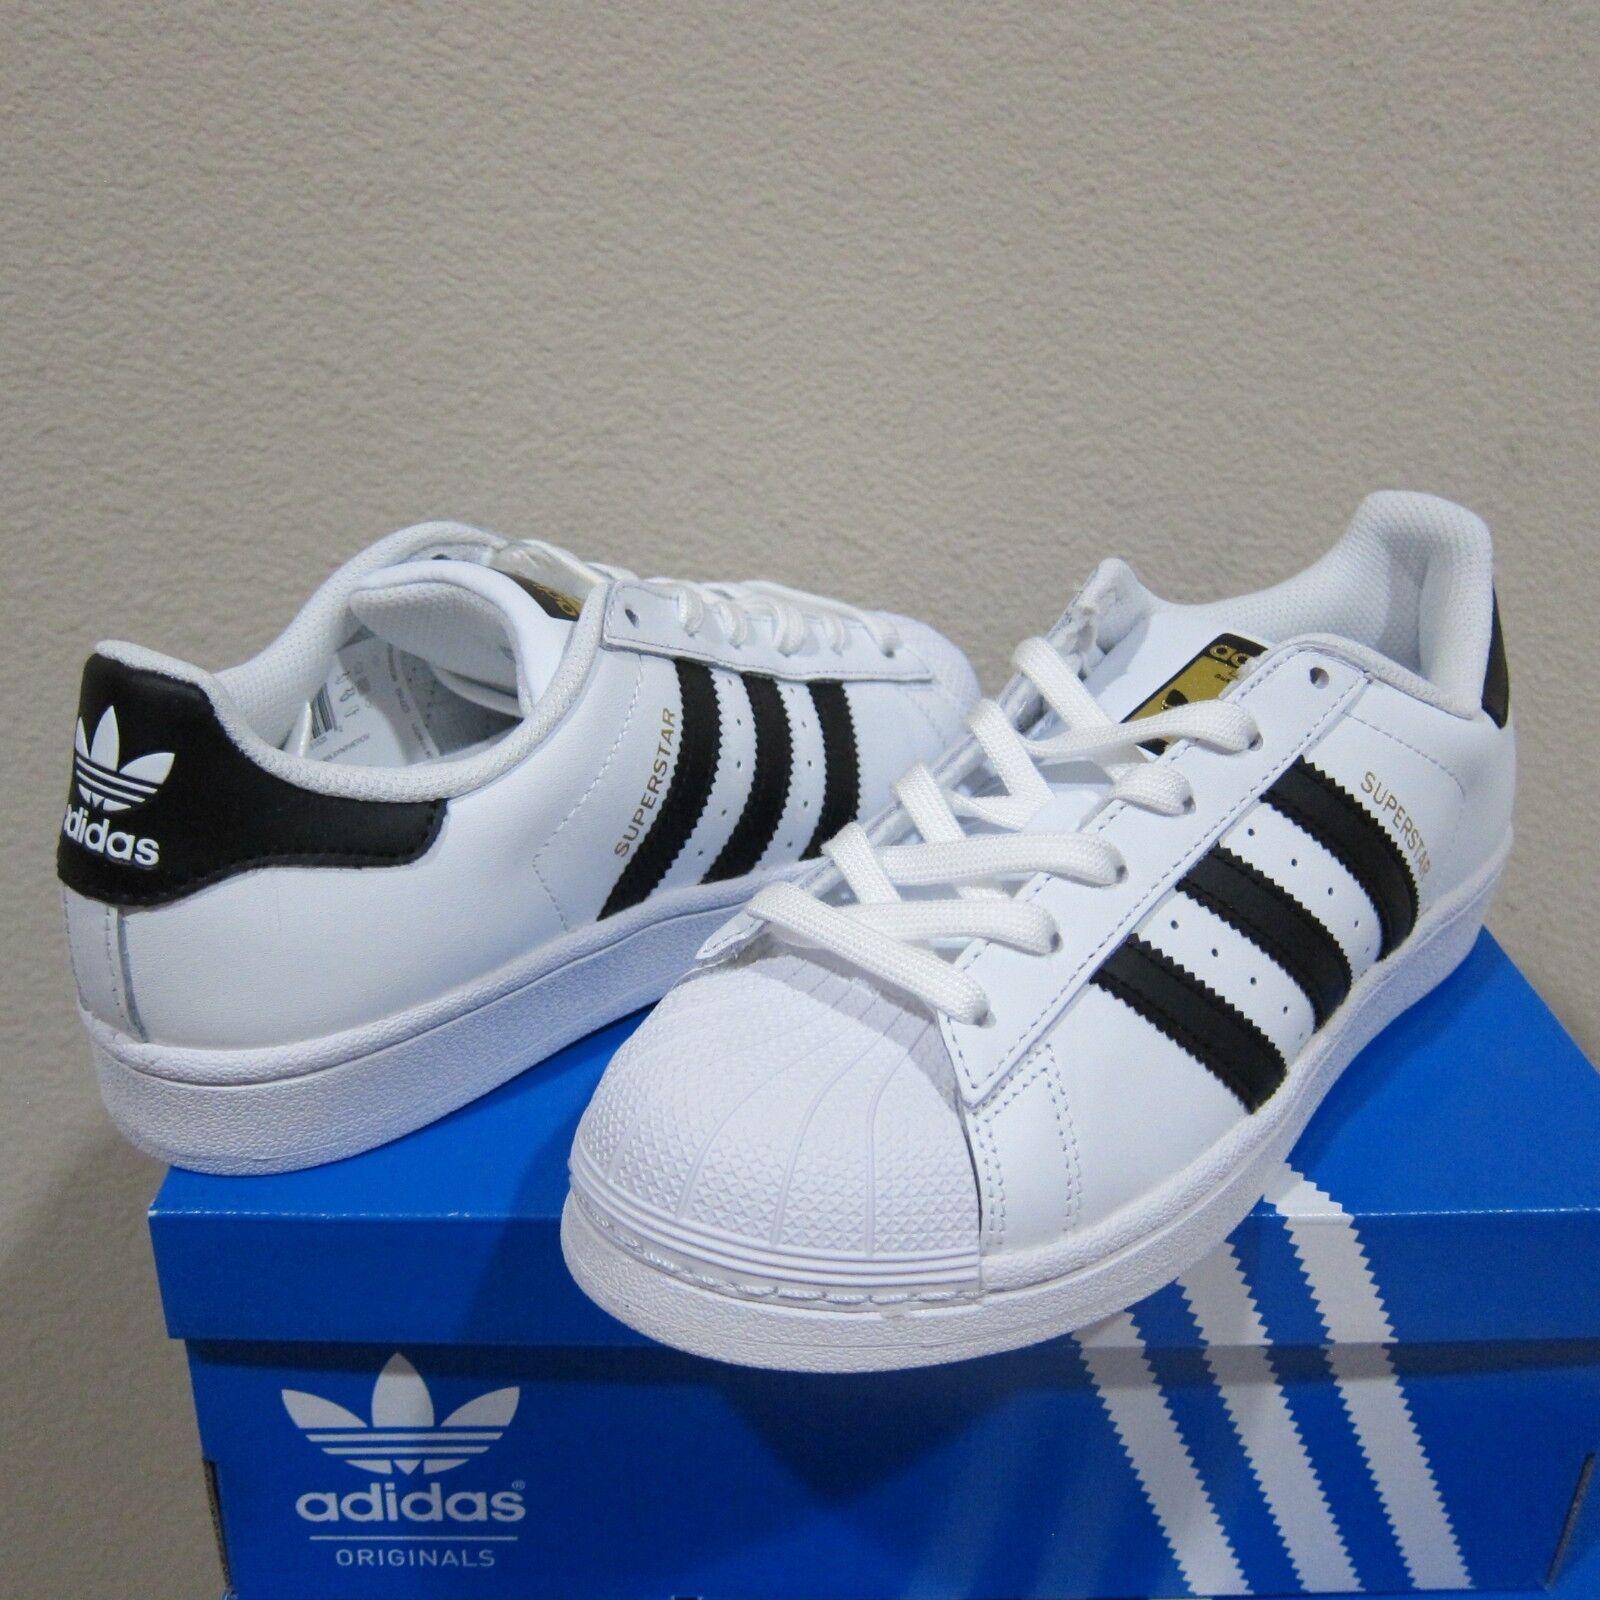 Adidas Originals Superstar  Chaussures  femmes  blanc/Noir/Gold Sneakers